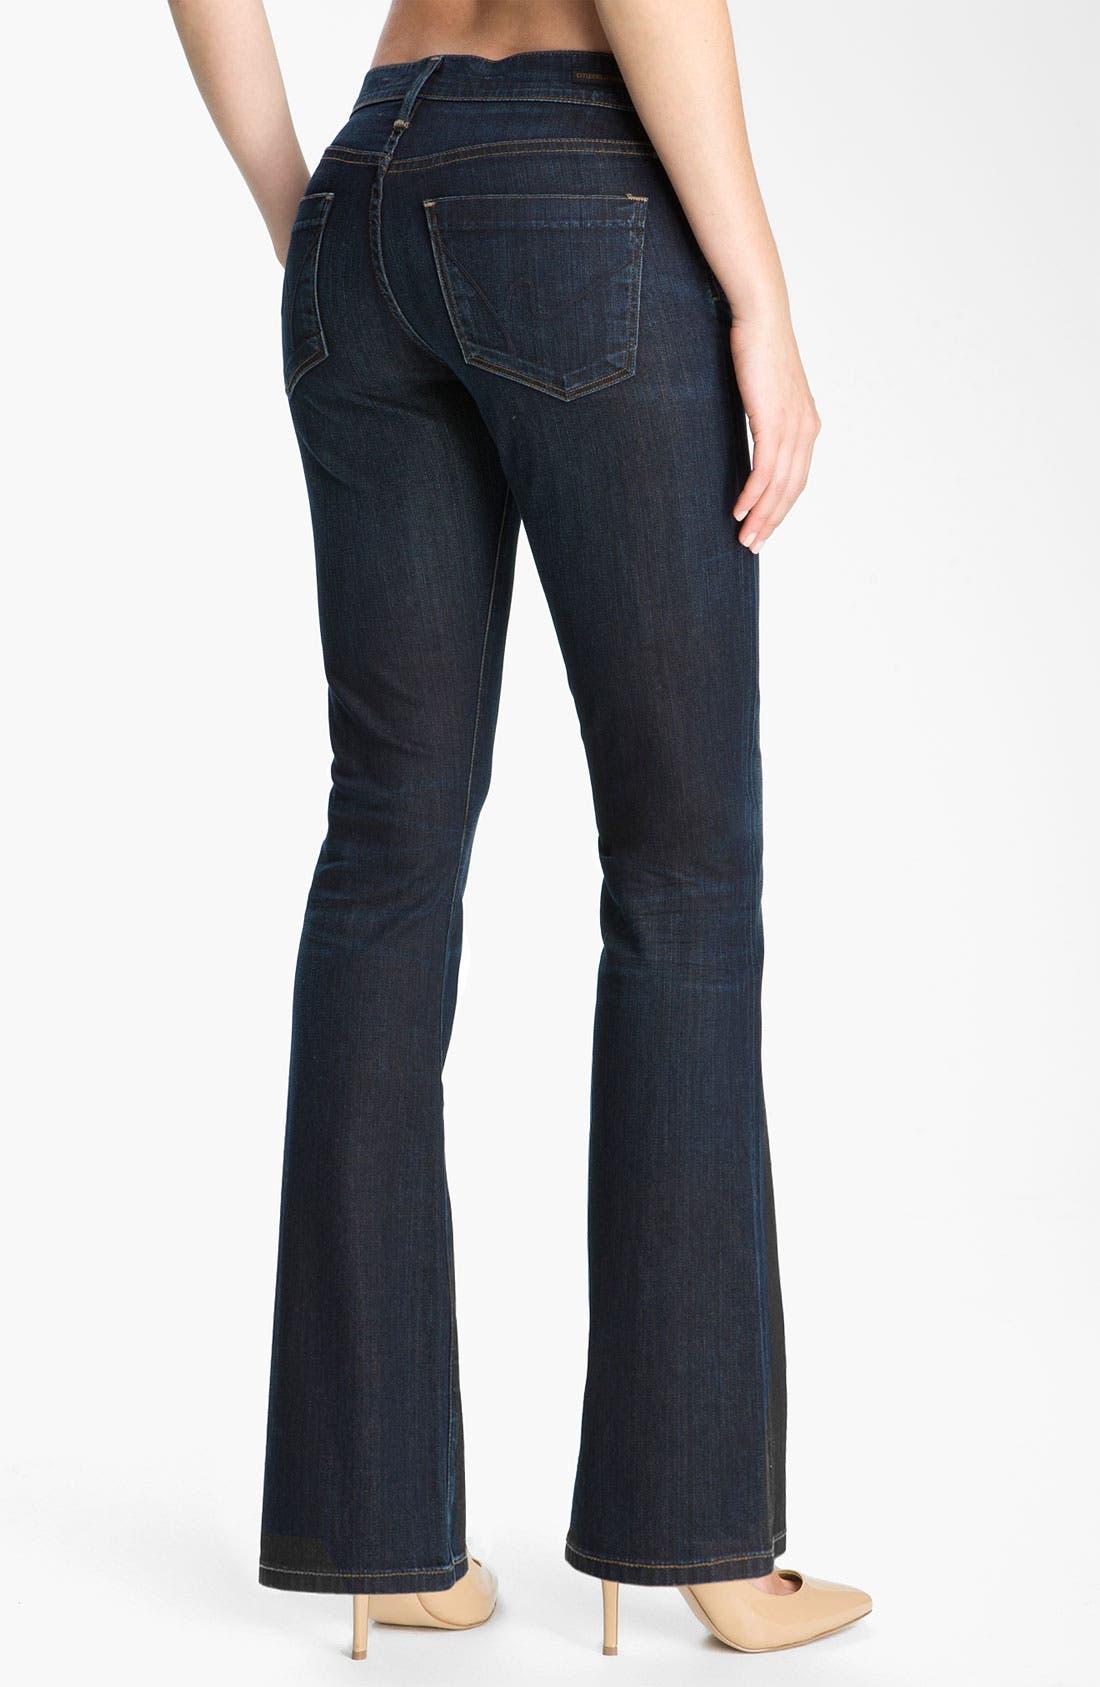 Alternate Image 2  - Citizens of Humanity 'Dita' Bootcut Jeans (Felt Dark Blue) (Petite)